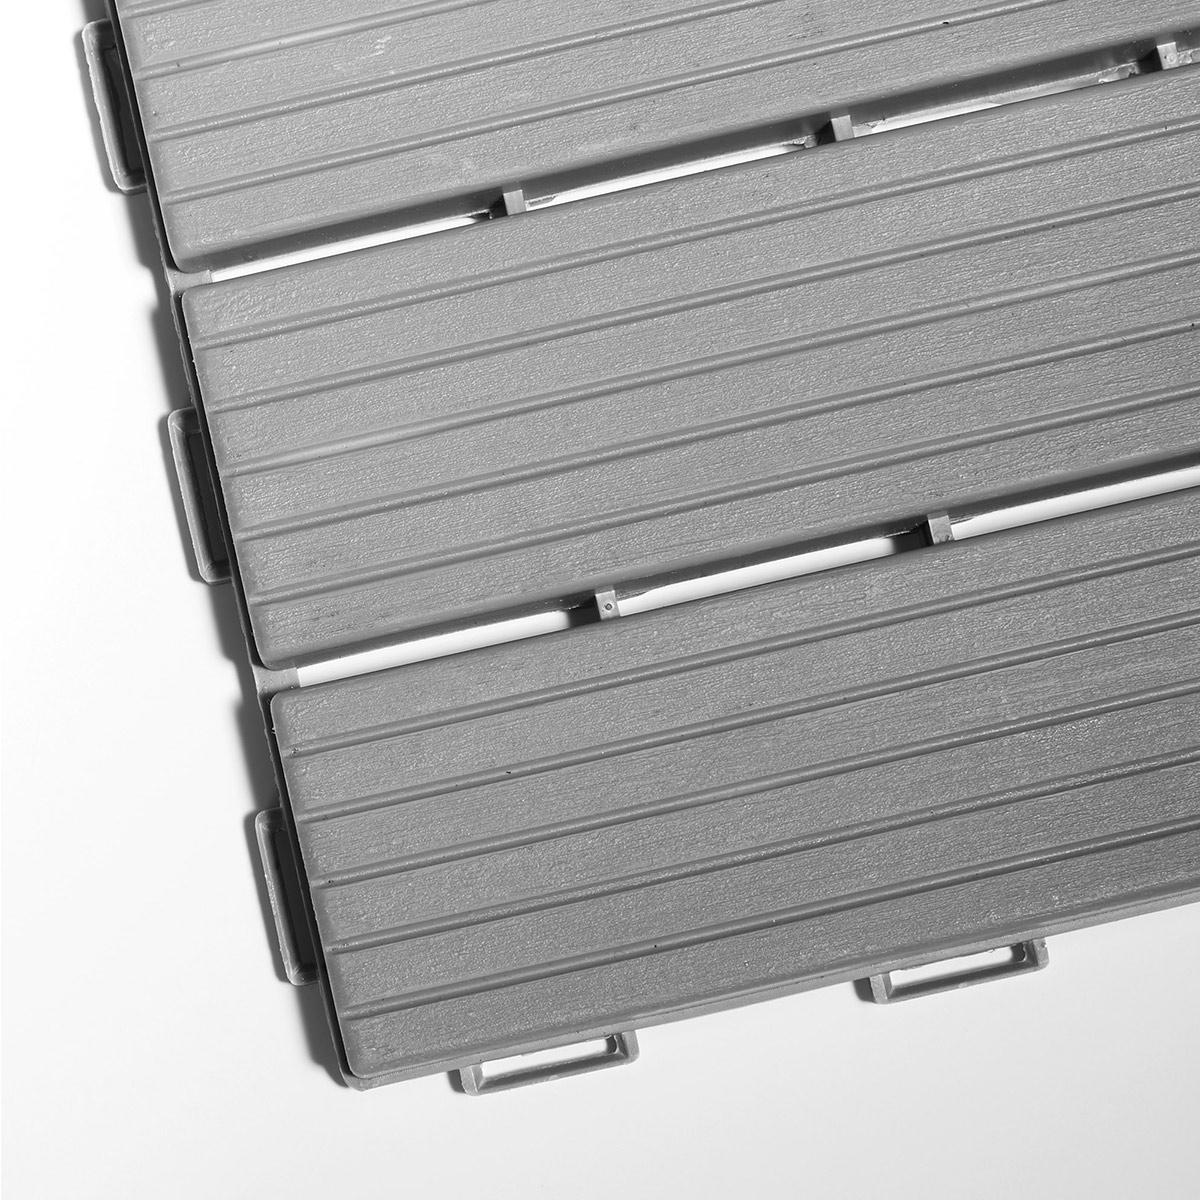 Kunststoff Bodenfliesen 9er Set 30 X 30 Cm Grau Gartenfreude